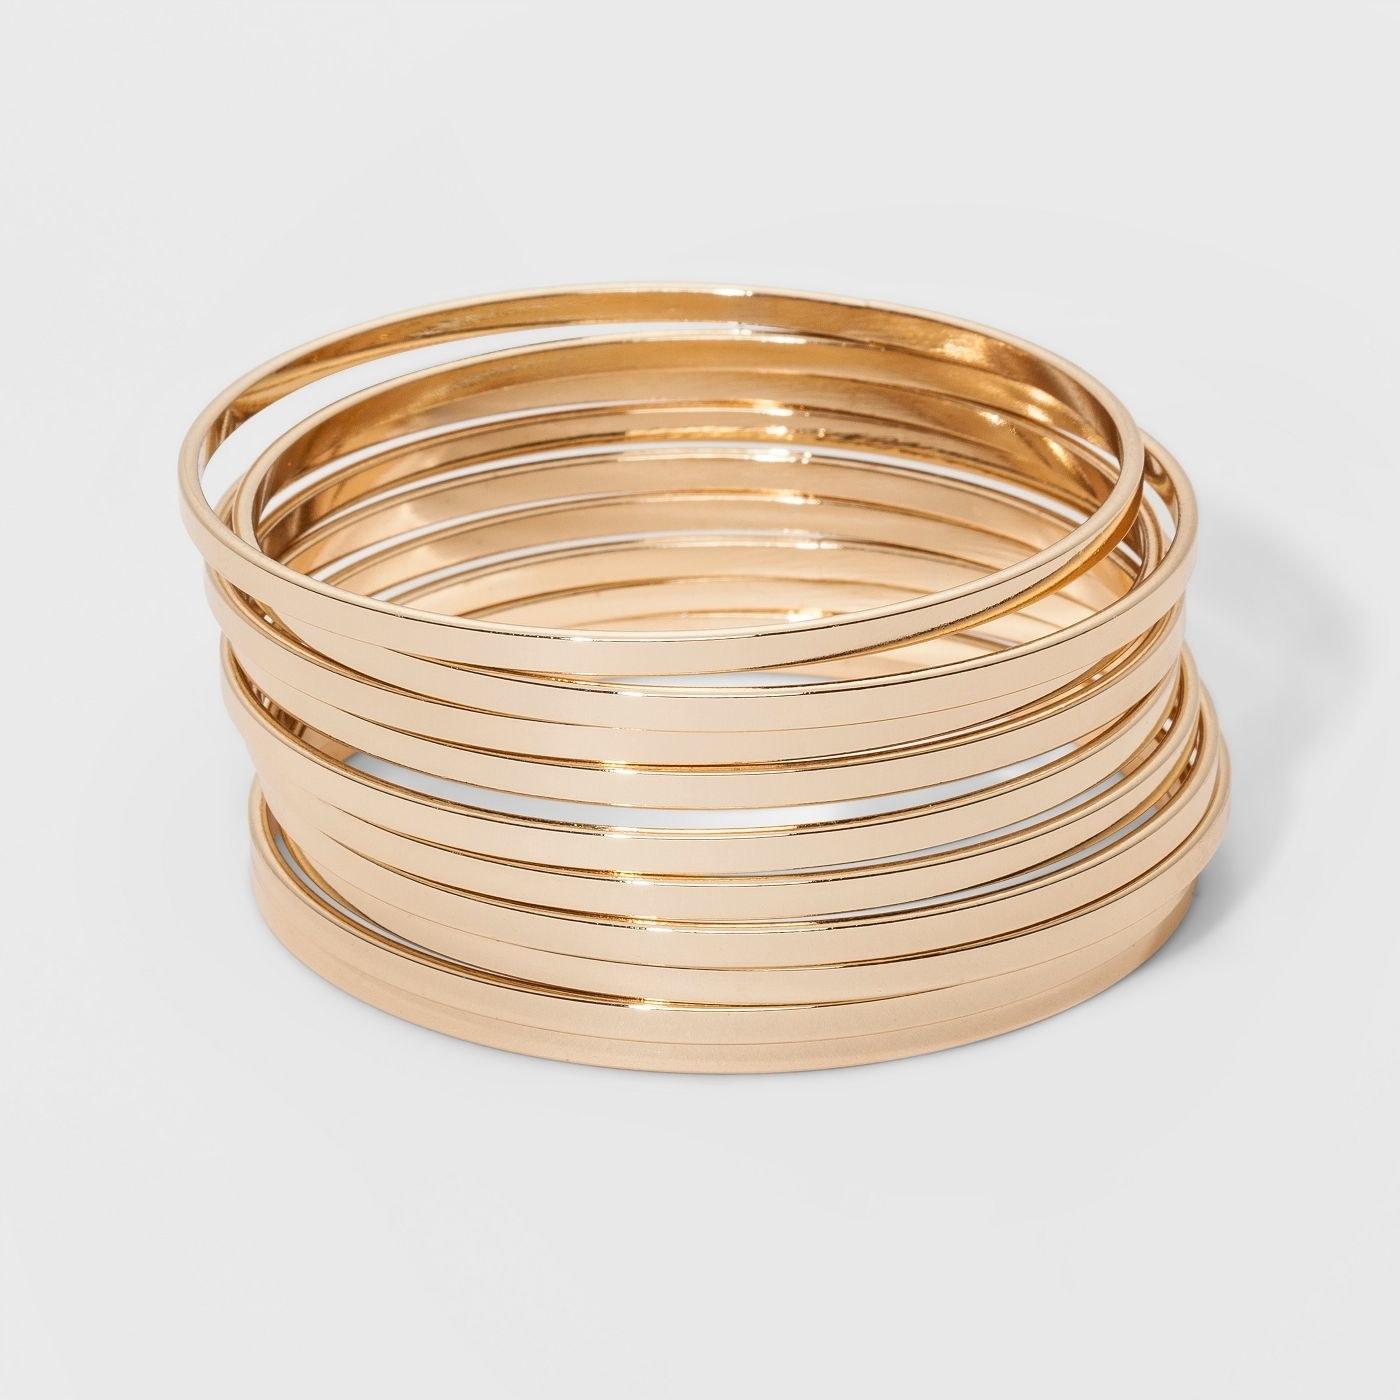 Set of 10 gold bangles